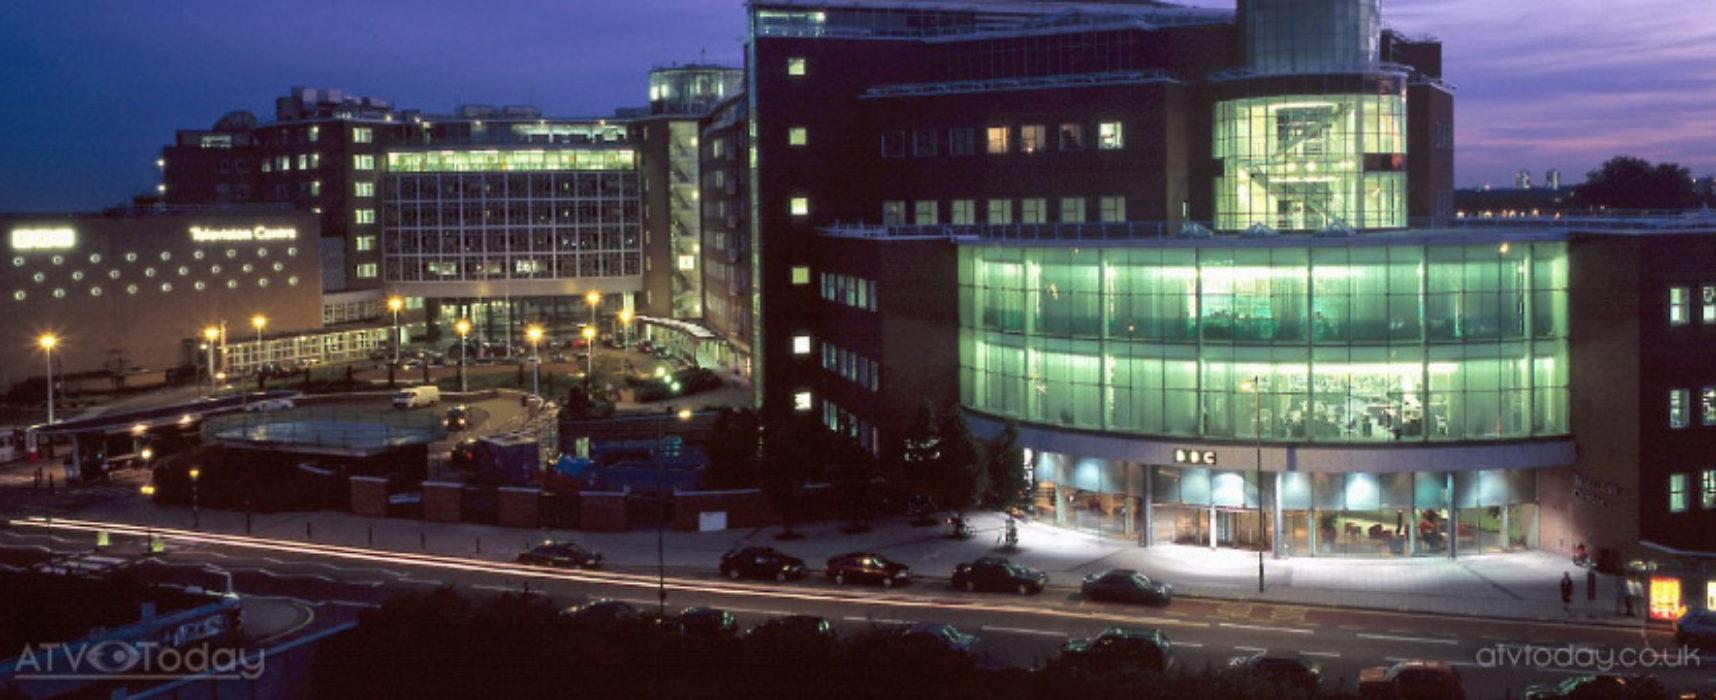 Strike by BBC Journalists disrupts news programmes